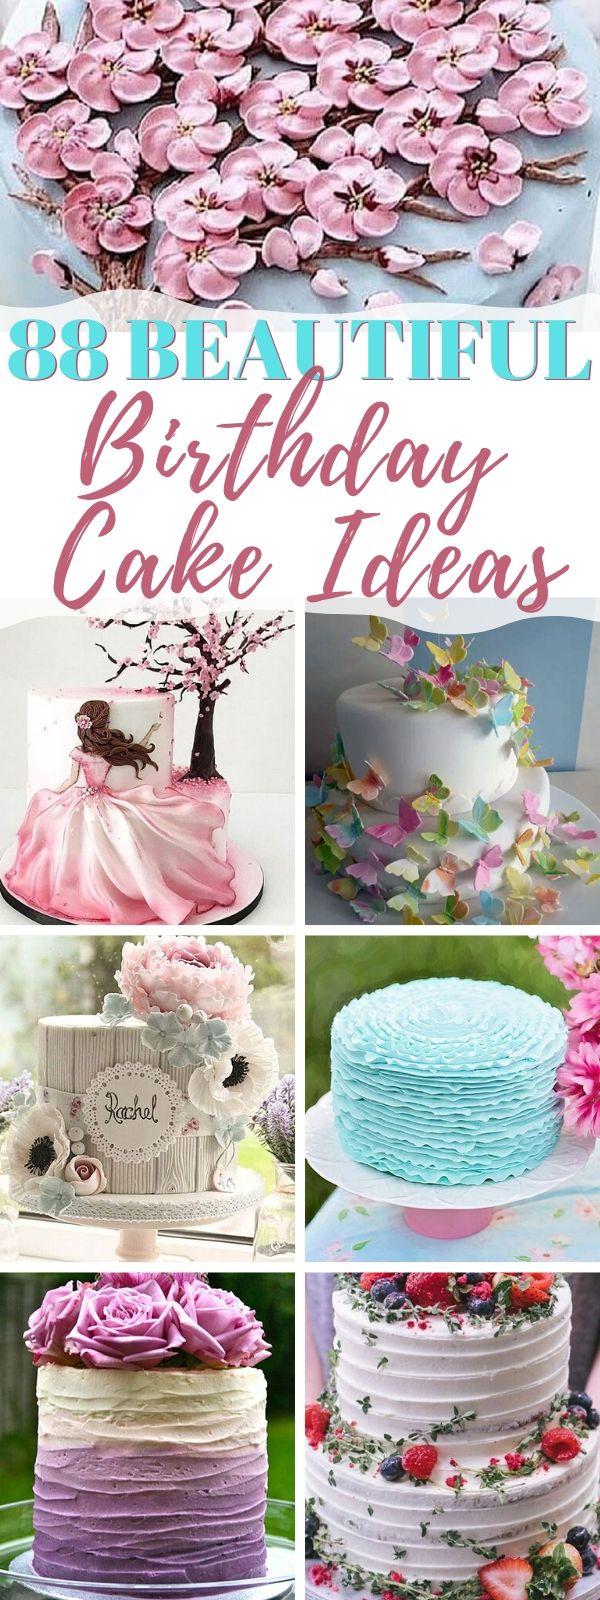 88 Beautiful Birthday Cake Ideas